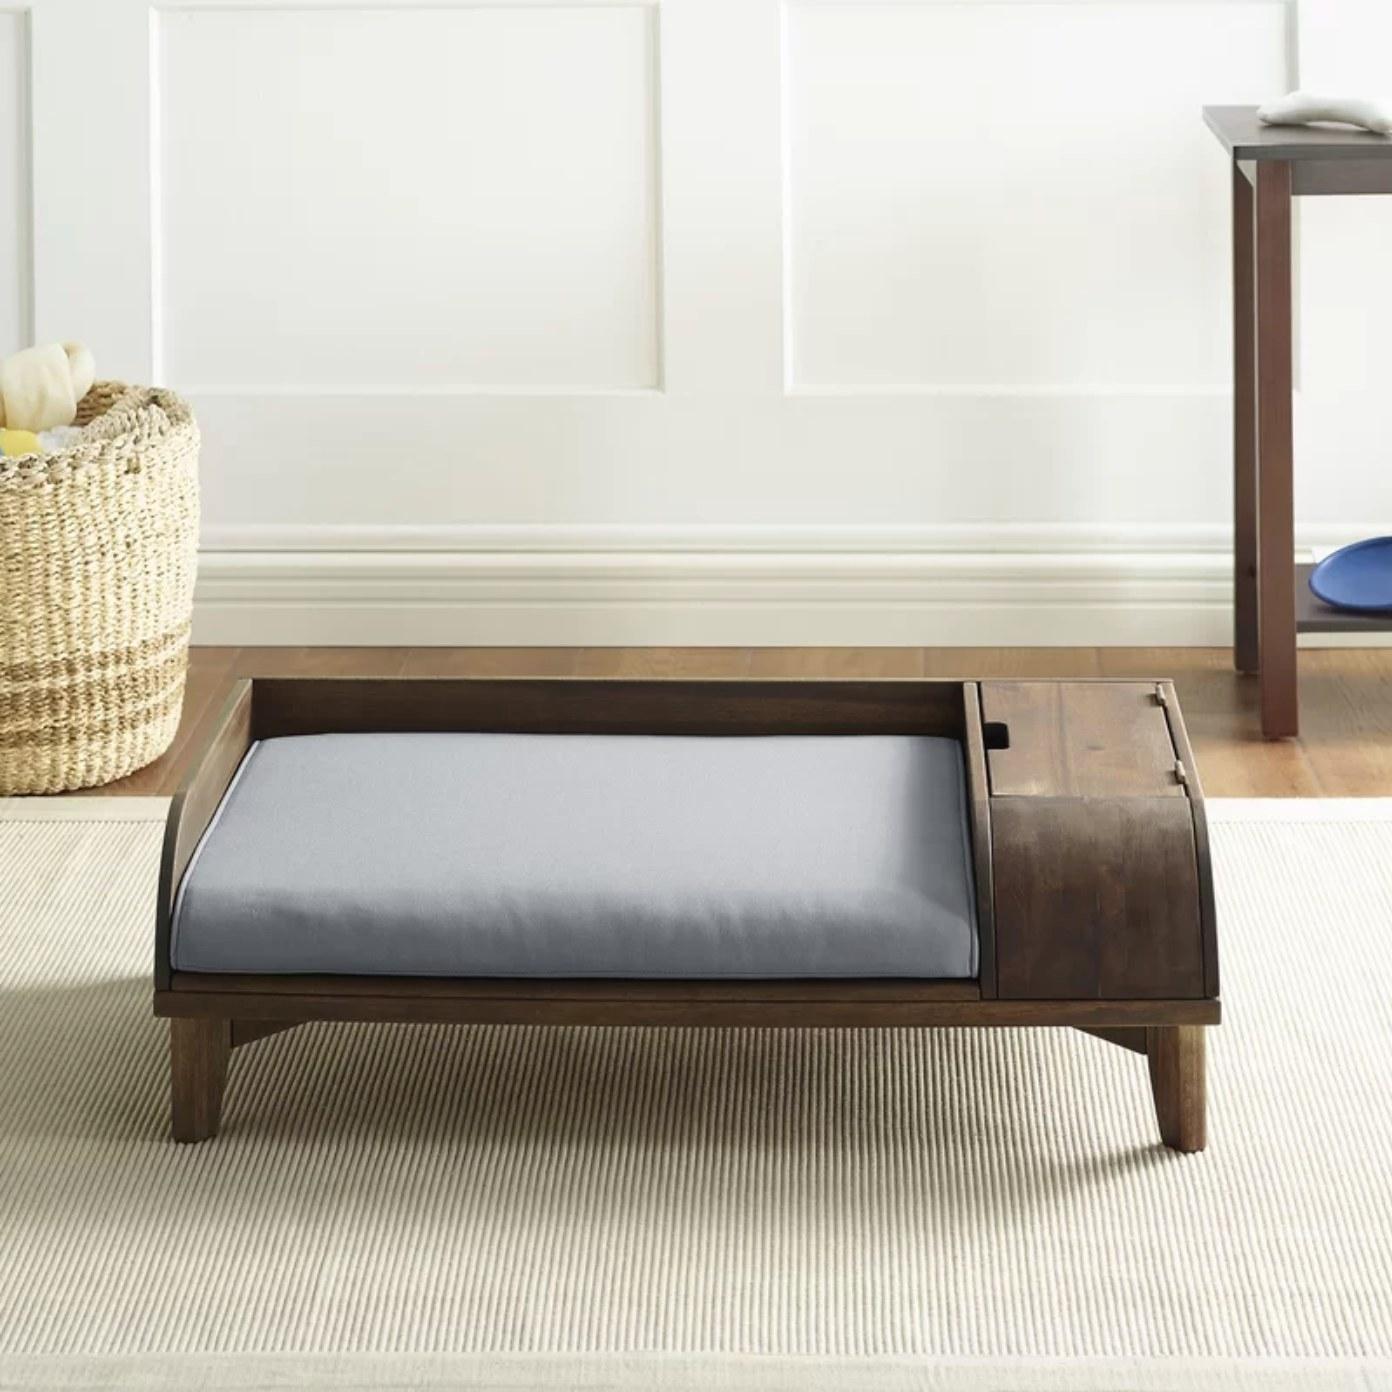 The dog sofa with storage